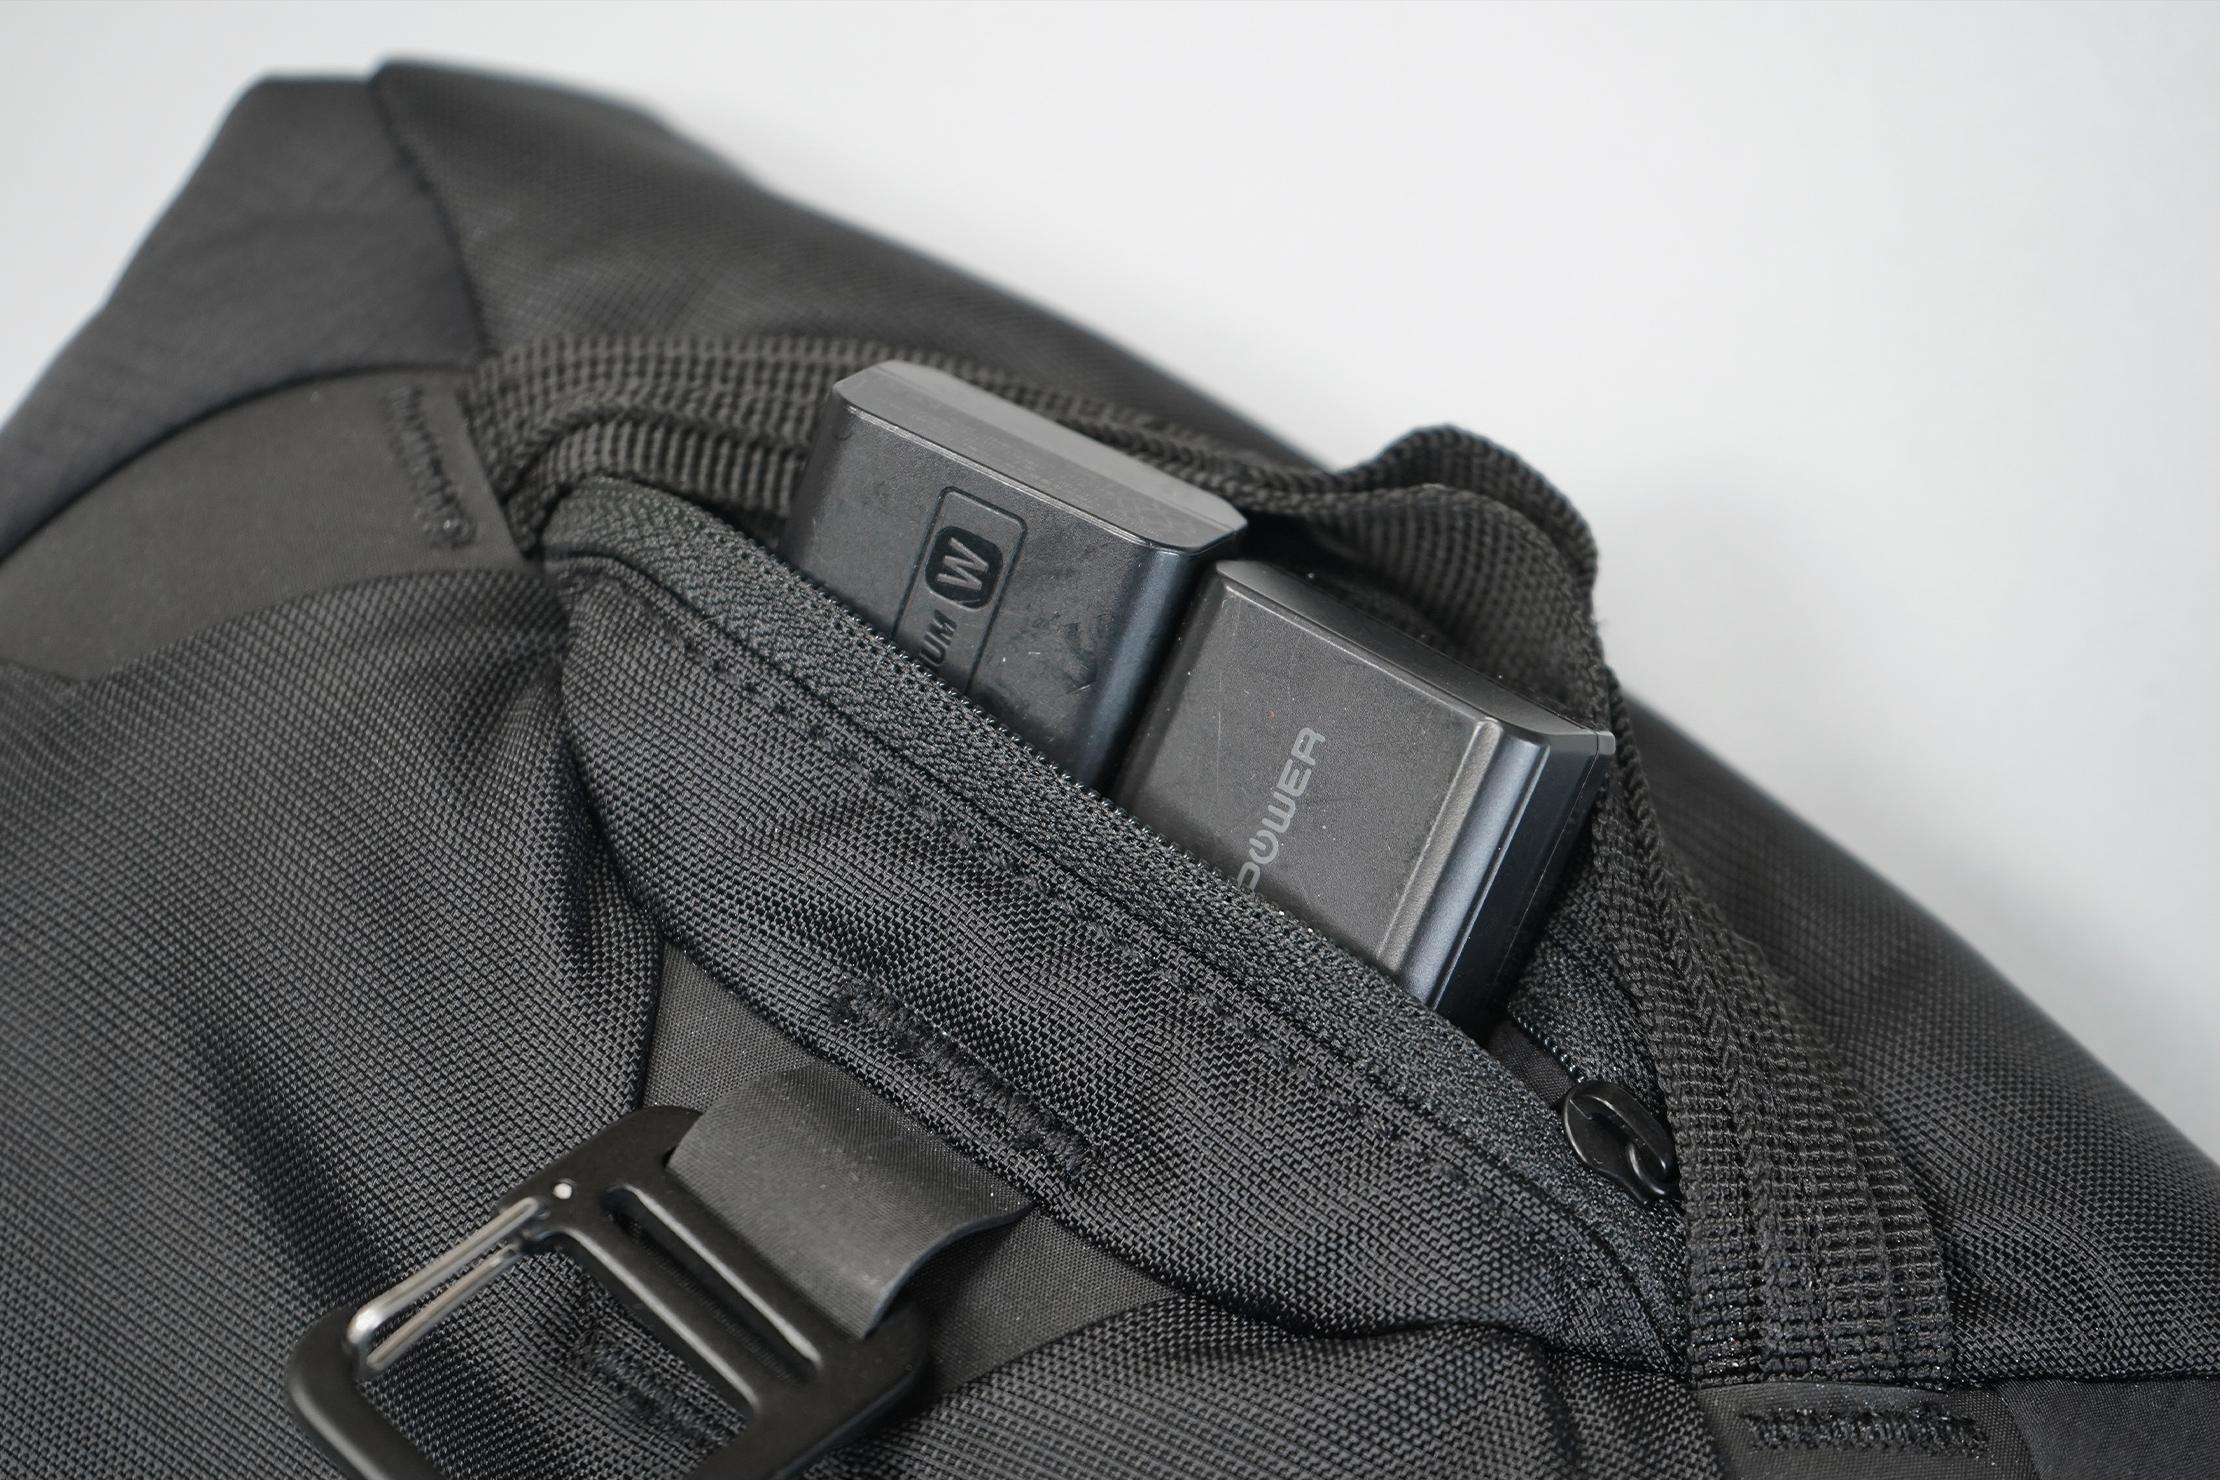 Matador Camera Base Layer 2.0 | The rear pocket for camera accessories.